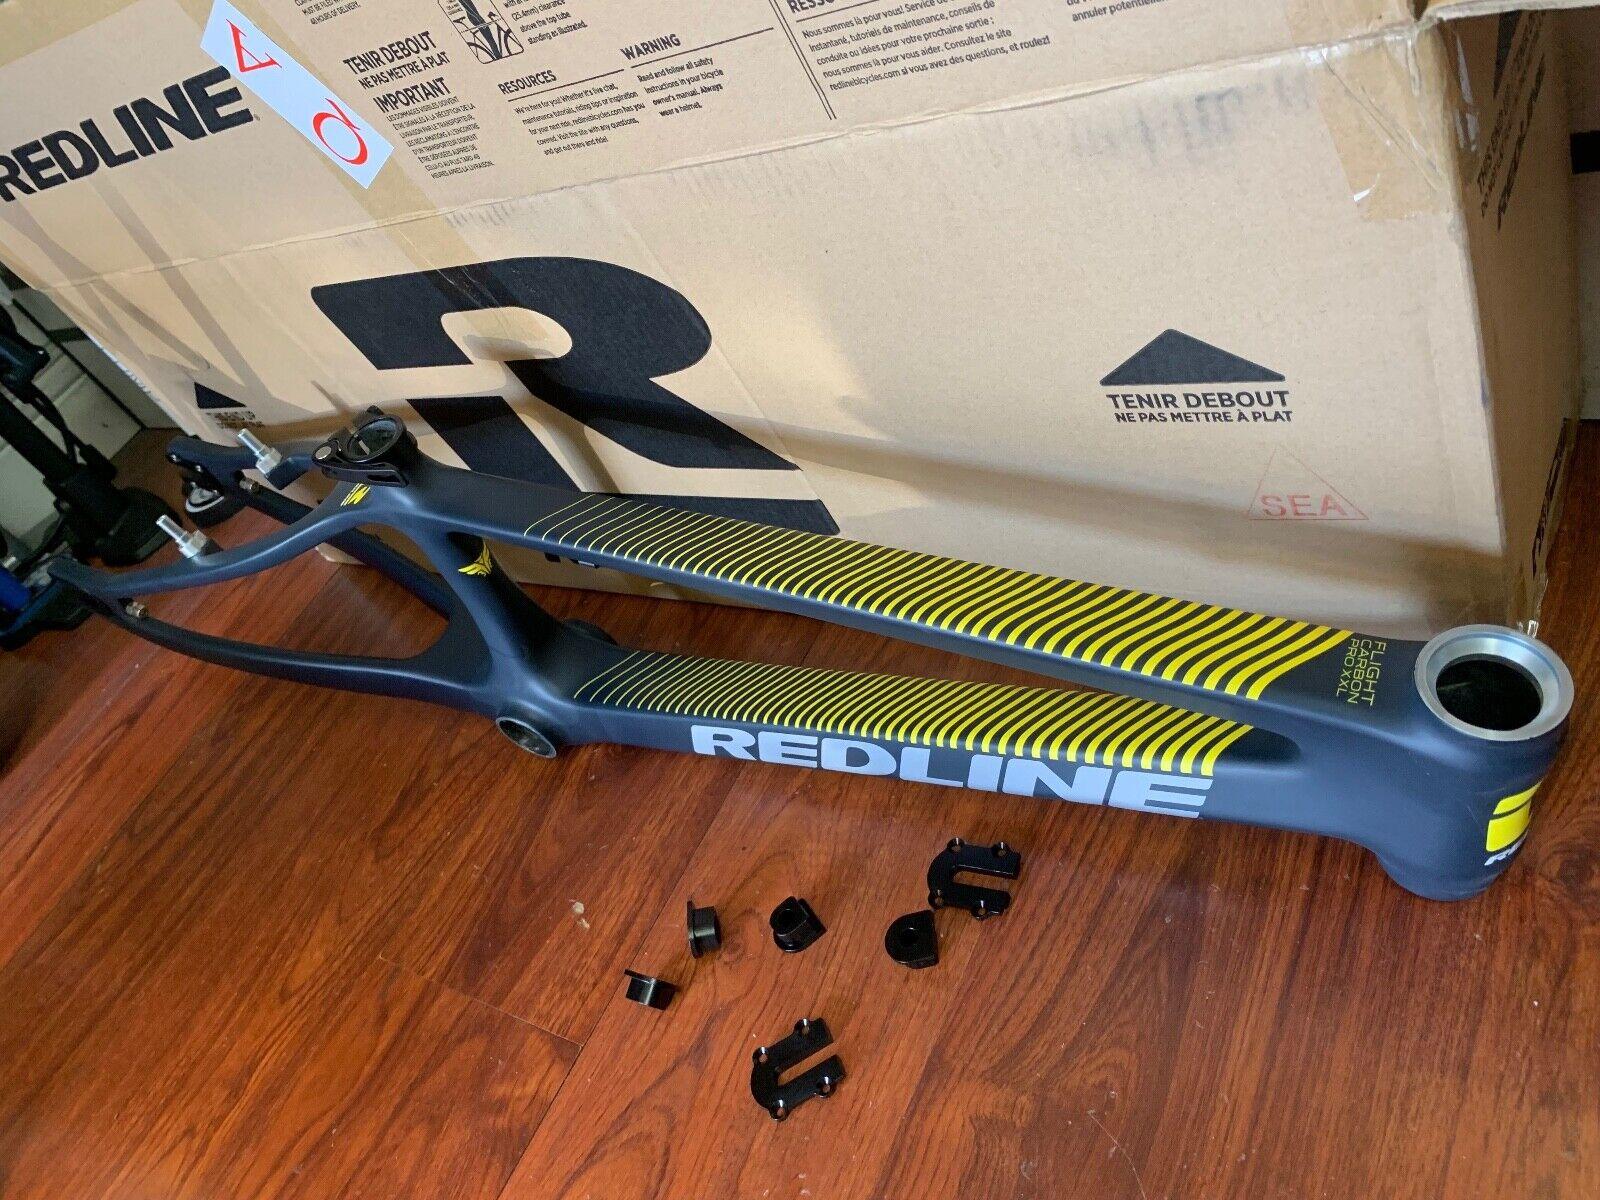 rojoLINE bicicletas FLIGHT Carbono Pro XXL cuadro de BMX Negro 21.7 Bicicletas RACE 2019 21.7